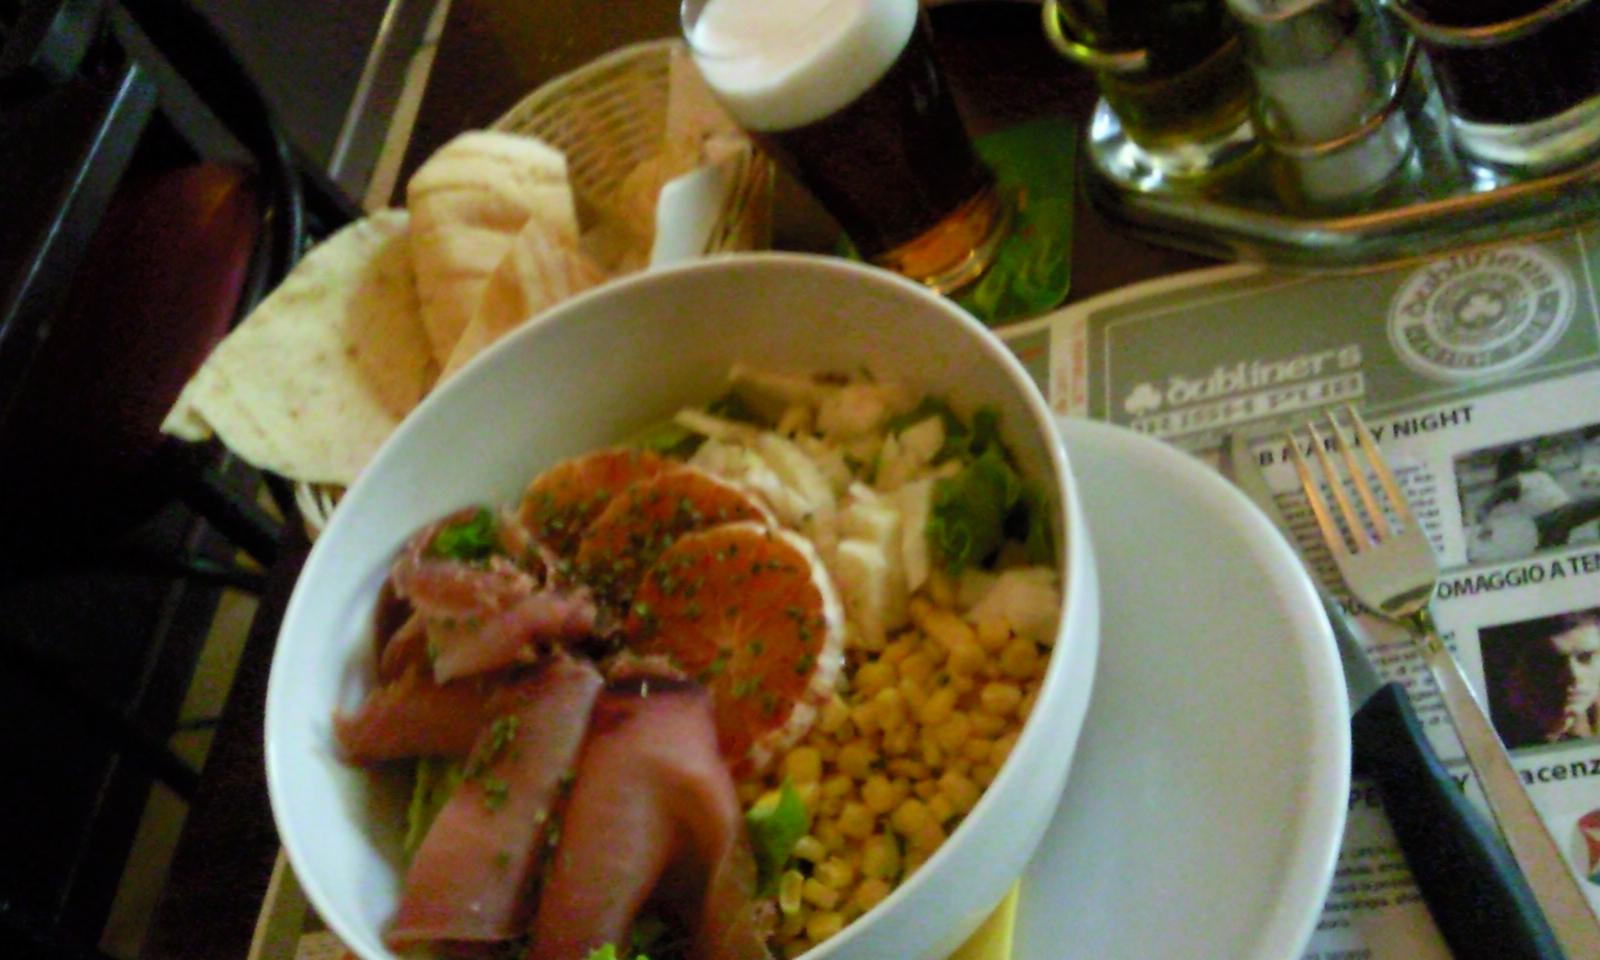 Tuna salad Dubliner lunch